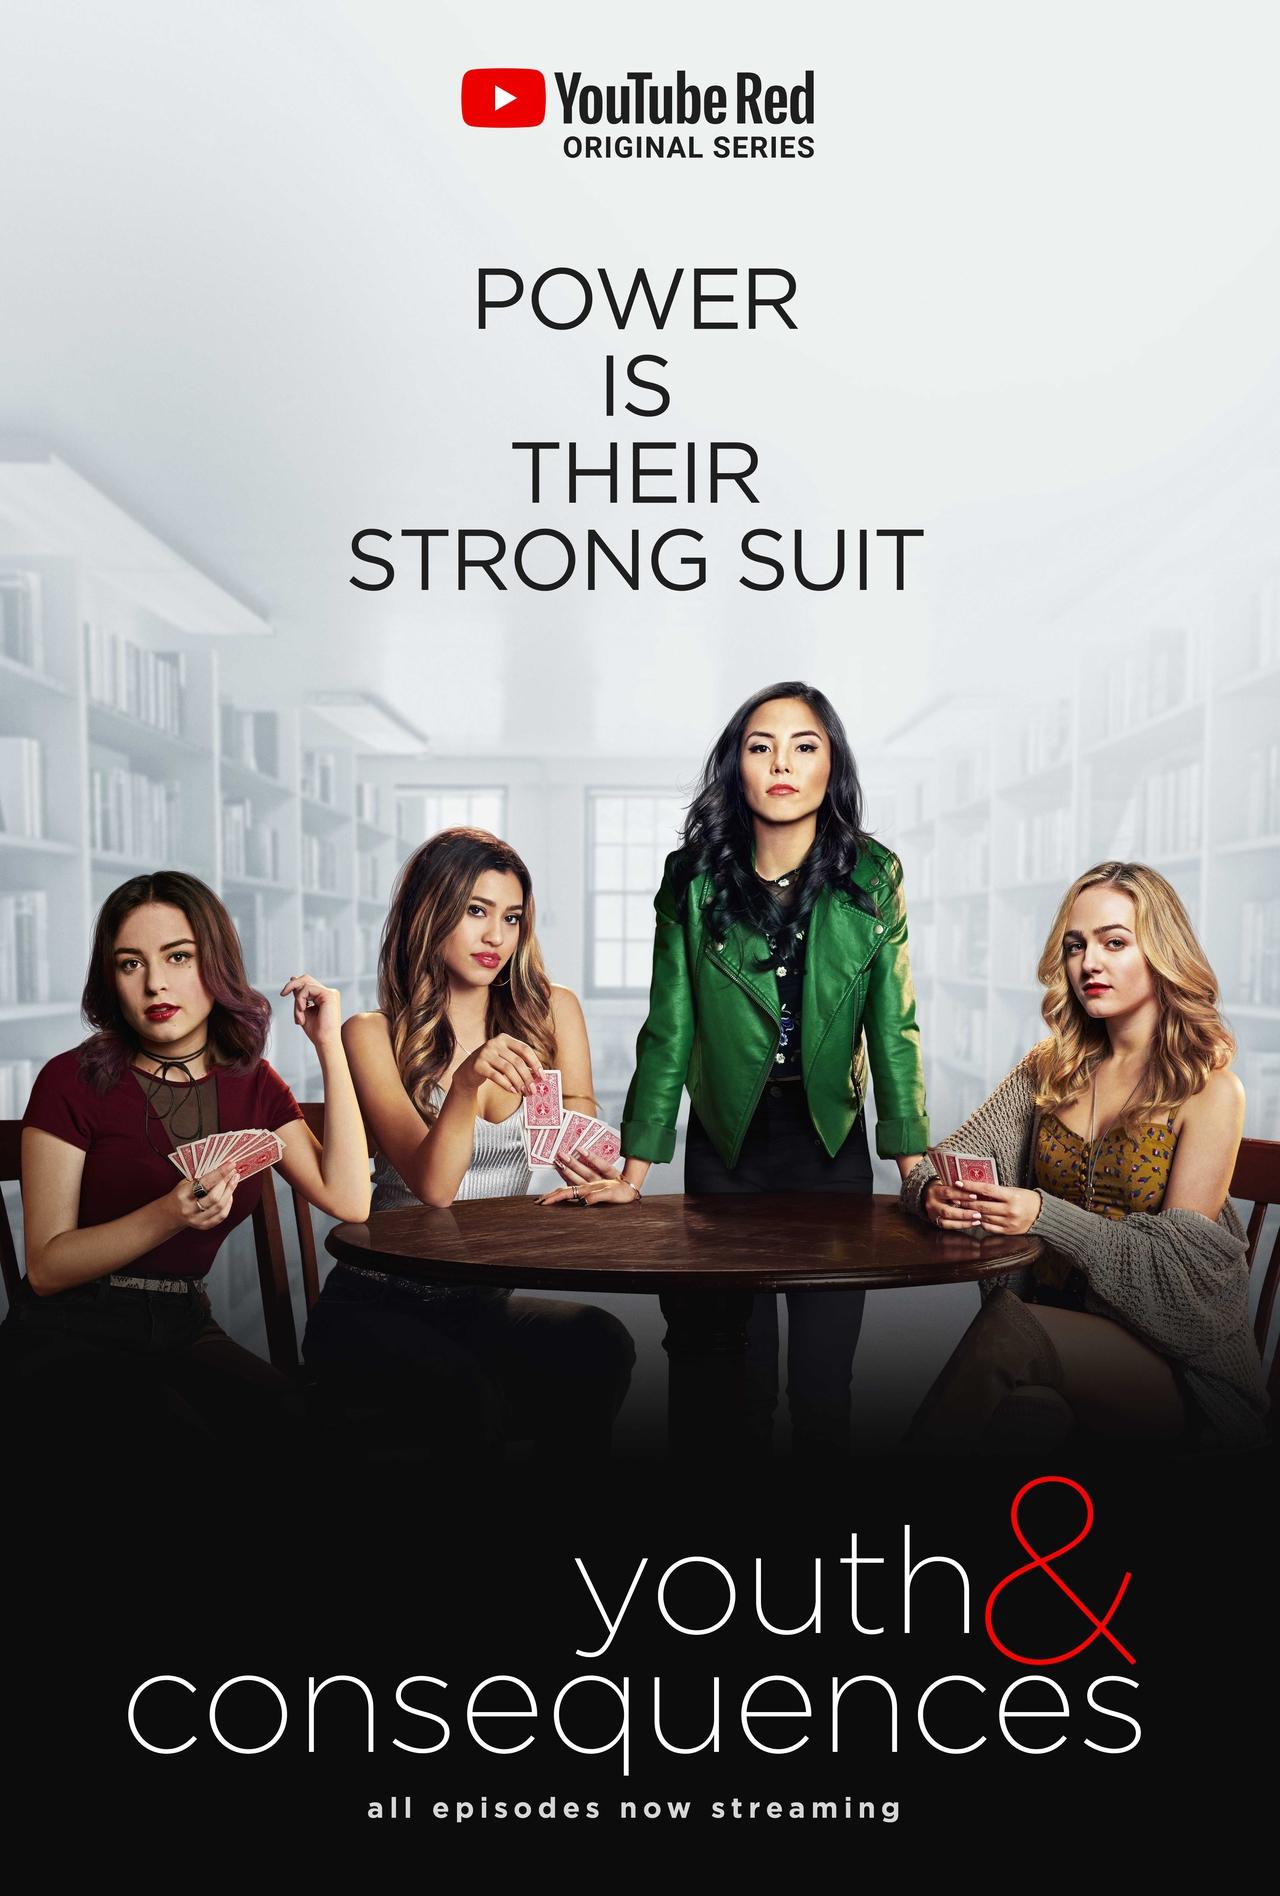 Anna Akana در صحنه سریال تلویزیونی Youth & Consequences به همراه Kara Royster، Sophie Reynolds و Katie Sarife